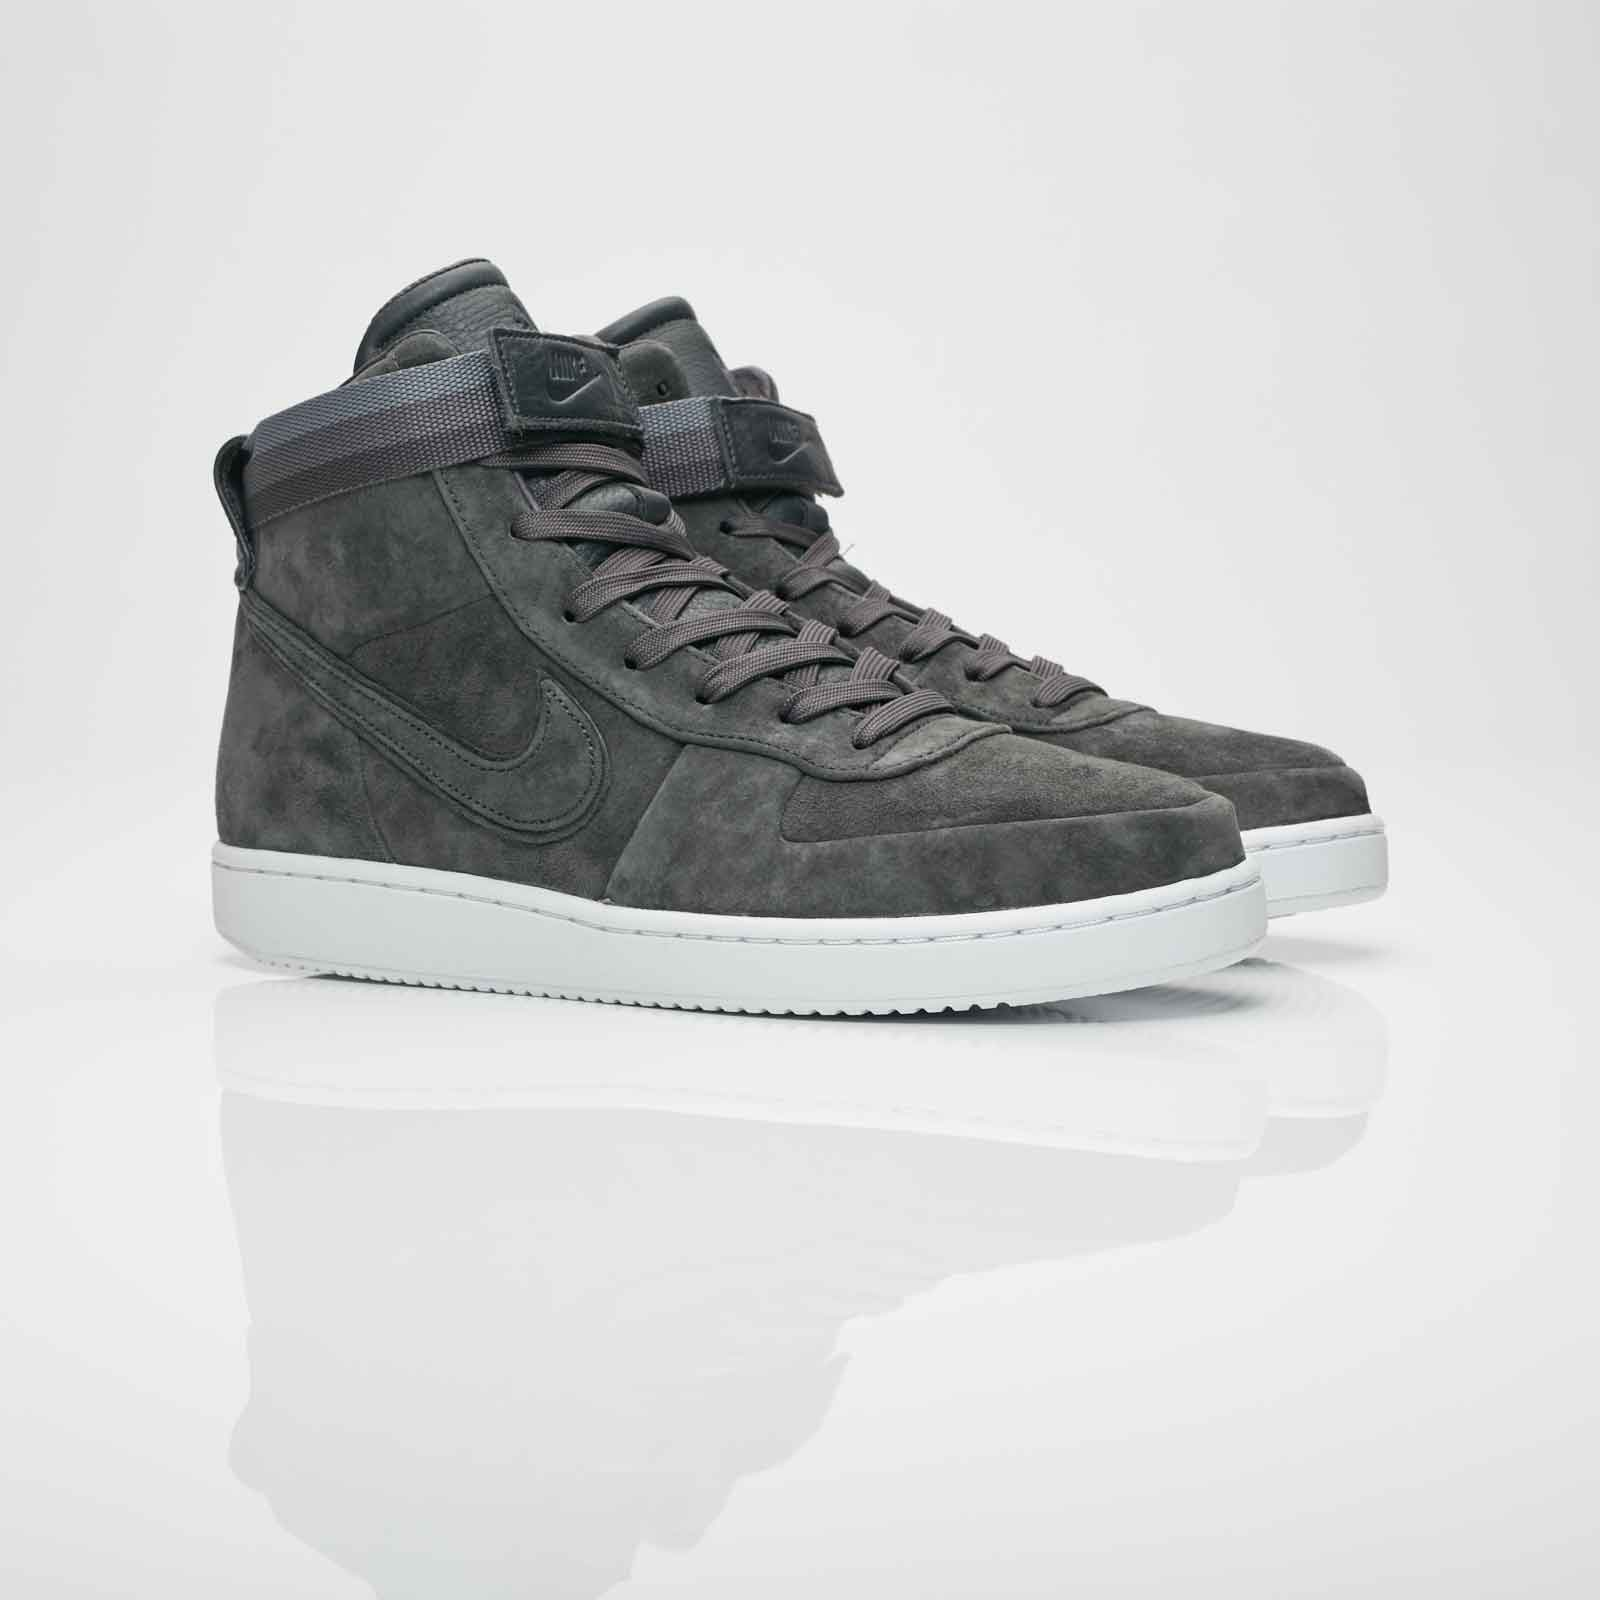 Nike Vandal High Premium x John Elliott